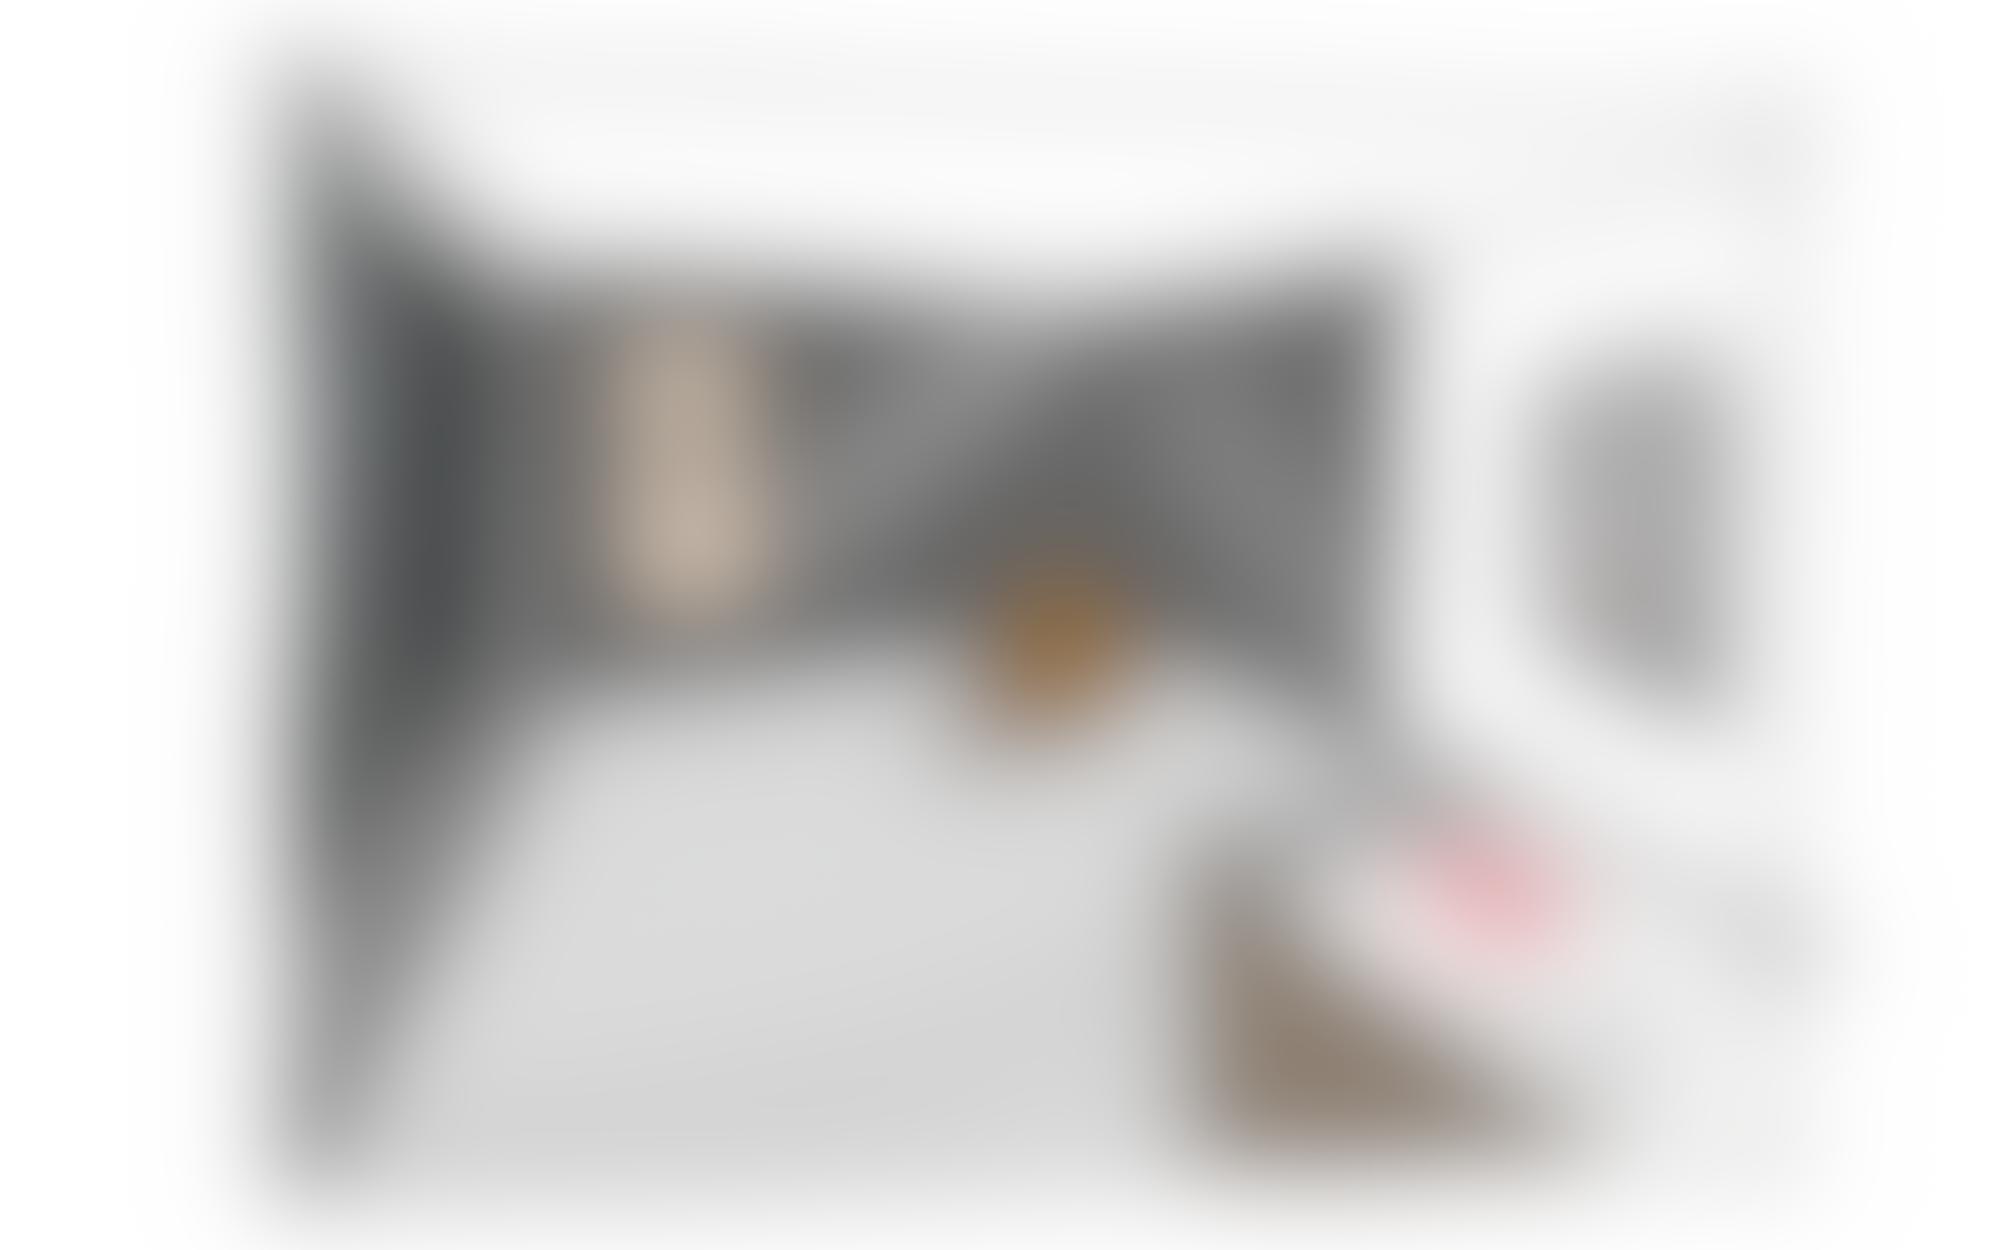 Keith haring joana filipe james mason tateliverpool lectureinprogress 05 autocompressfitresizeixlibphp 1 1 0max h2000max w3 D2000q80sff2d5872b95f2092551ab8e0a71eabce